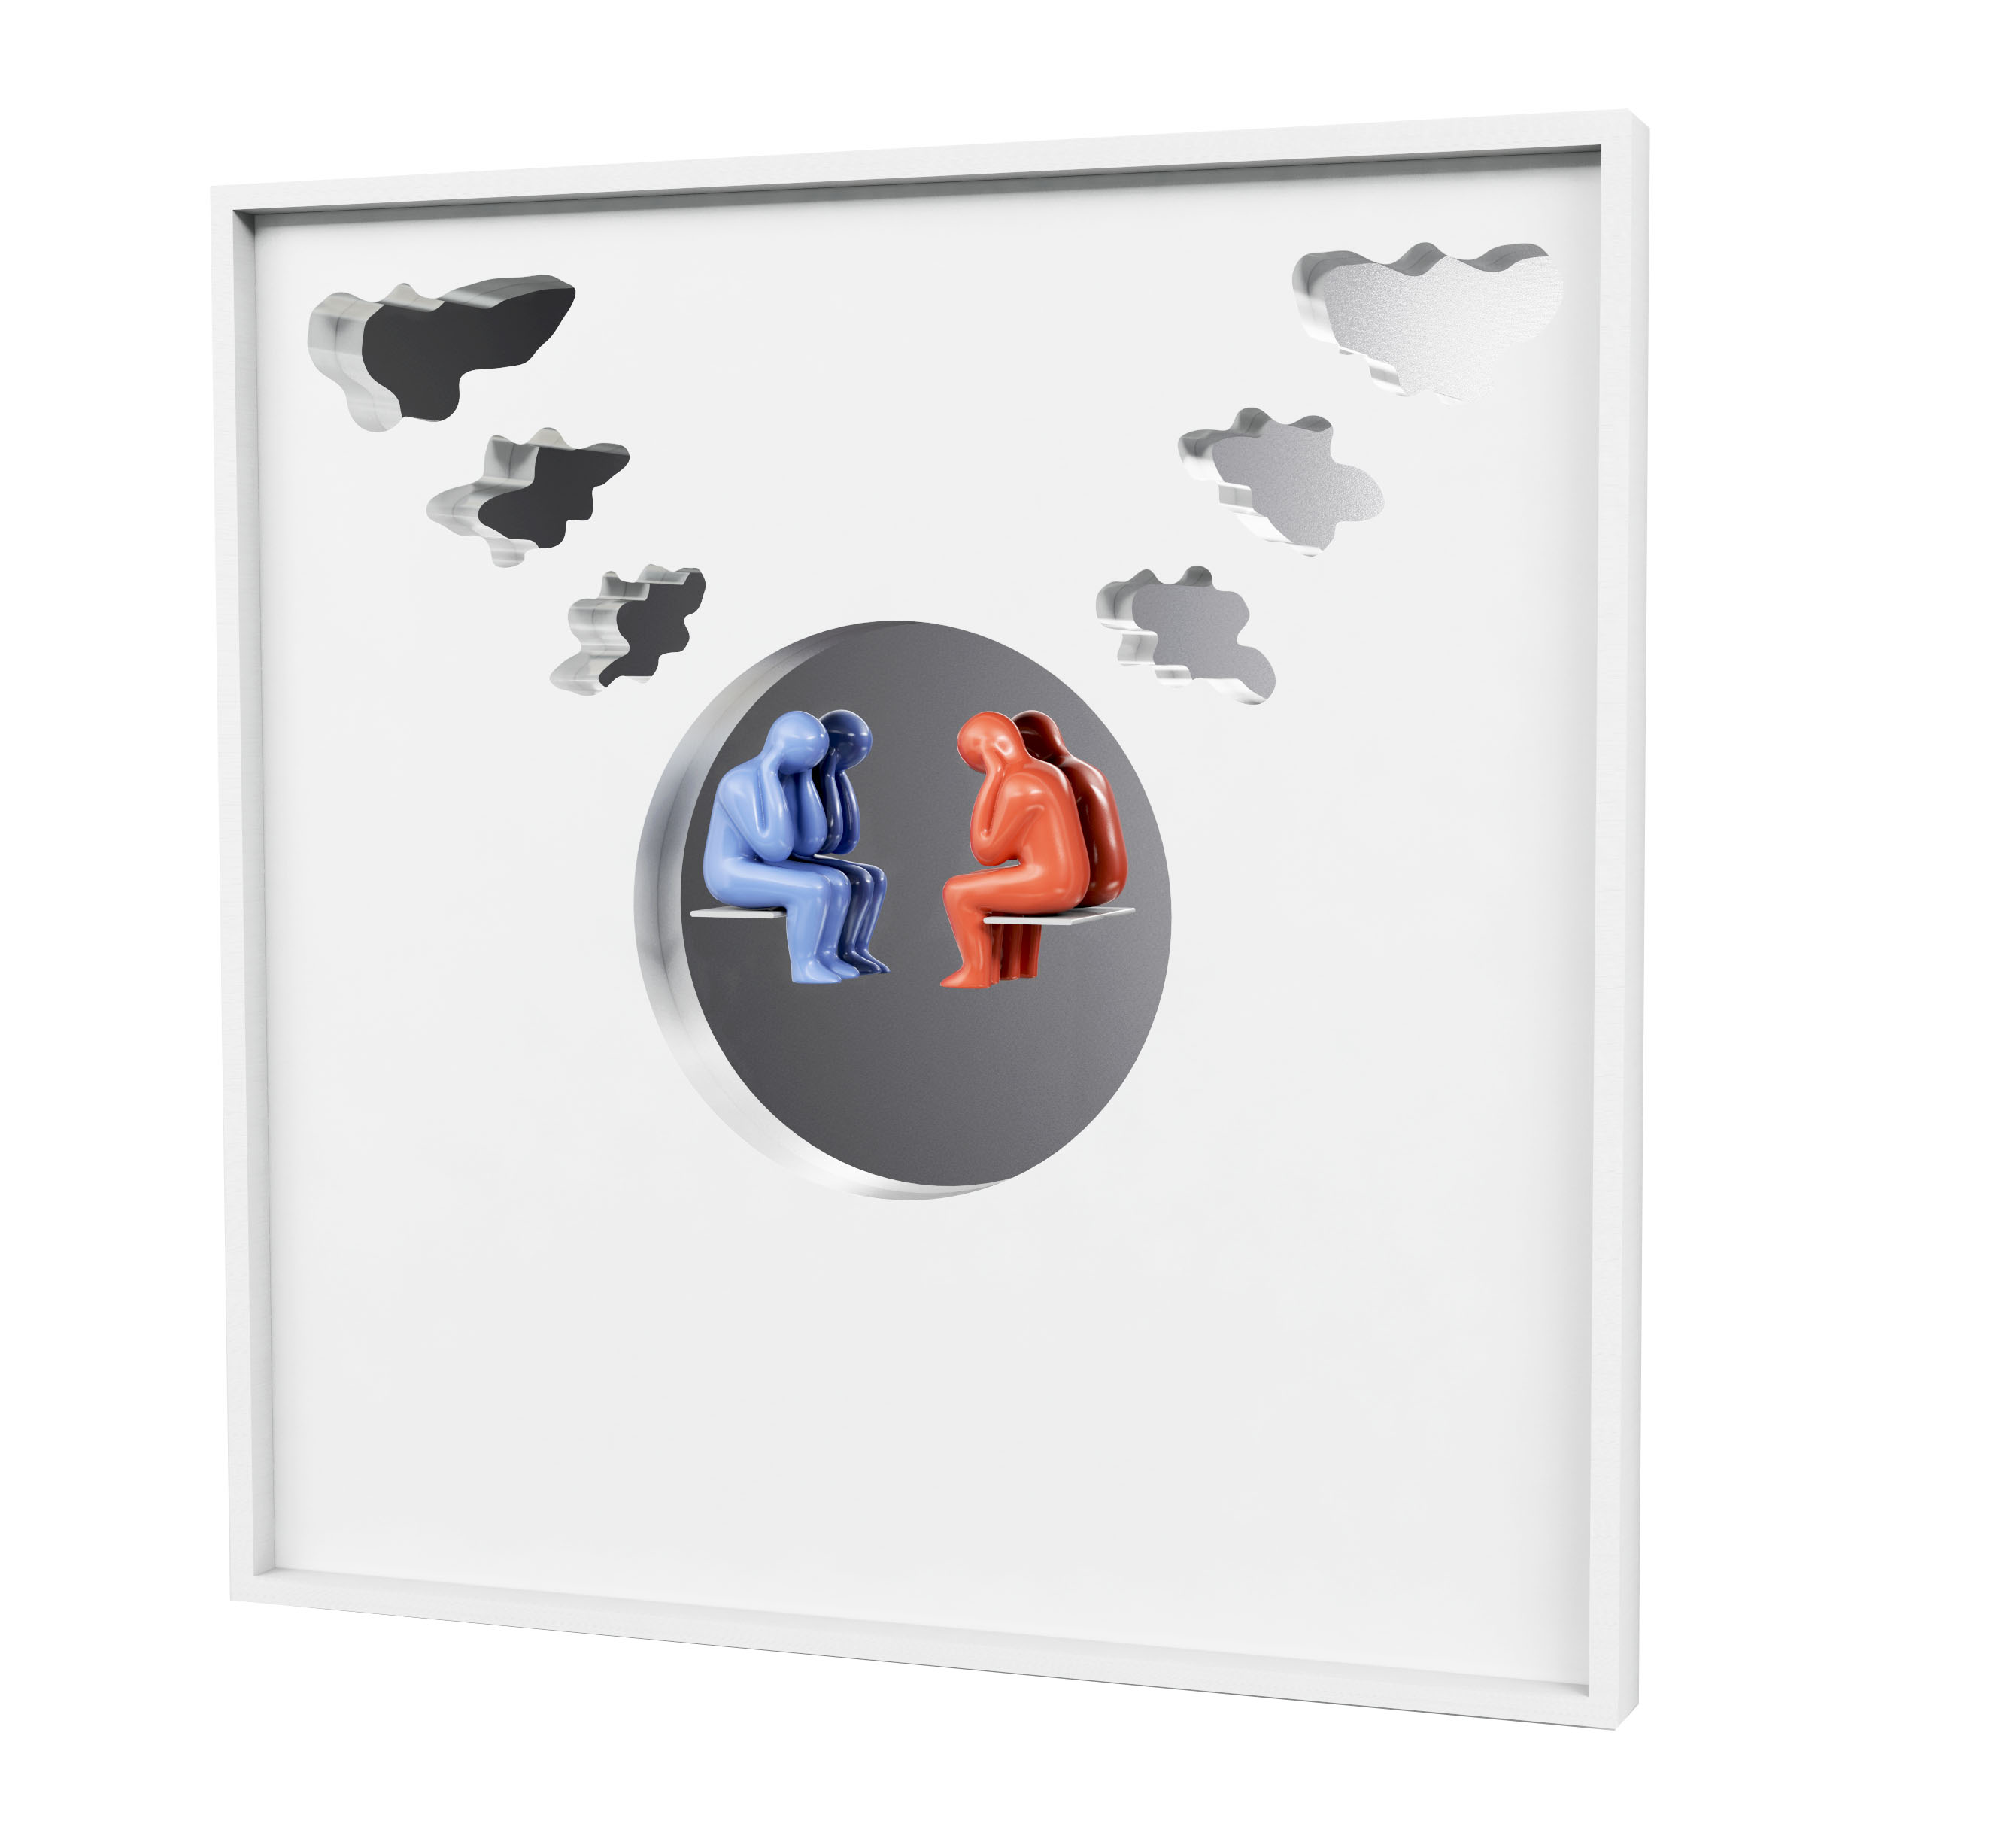 maurizio-balducci-artista-i-think2